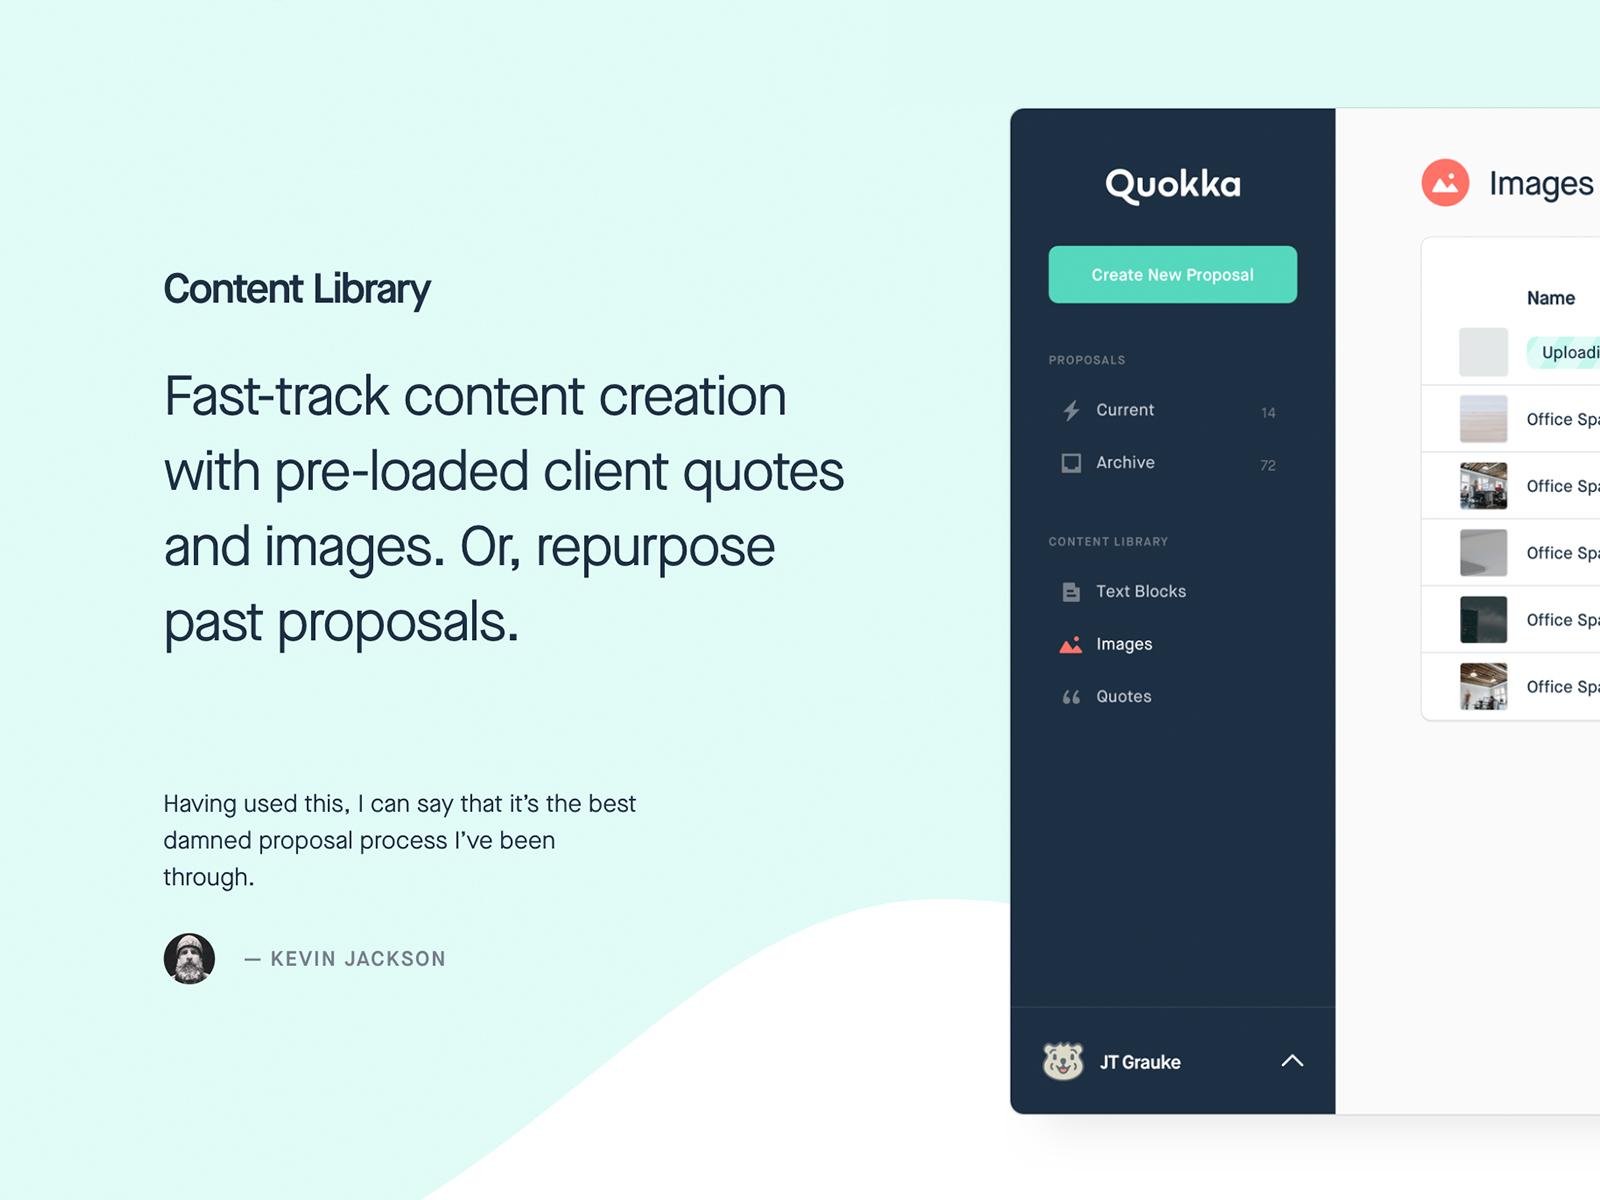 Quokka content library